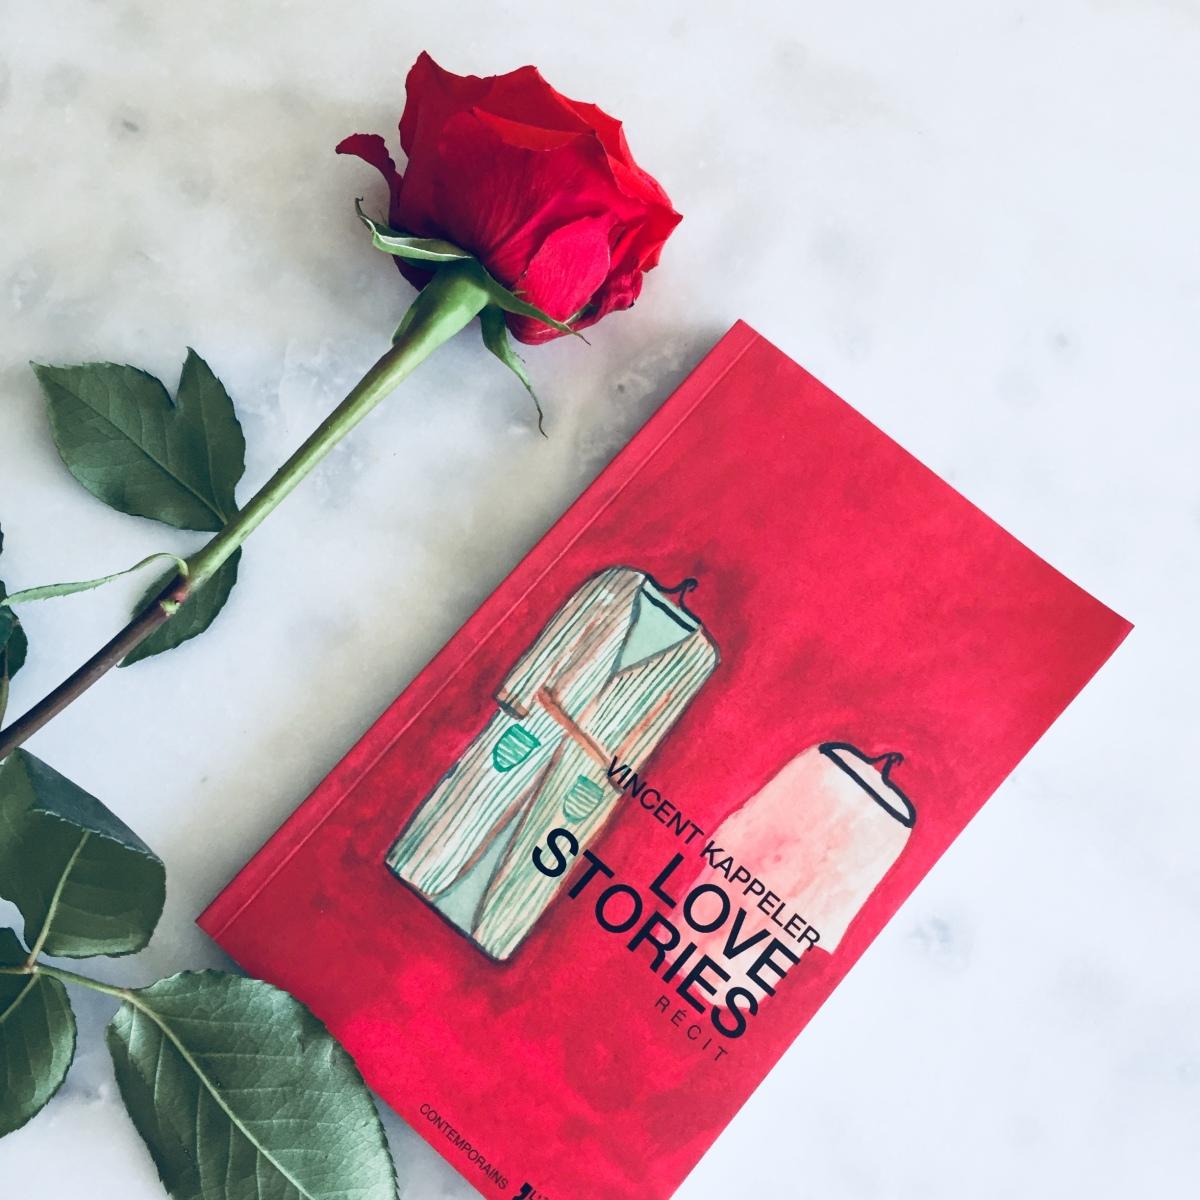 Love stories de VincentKappeler